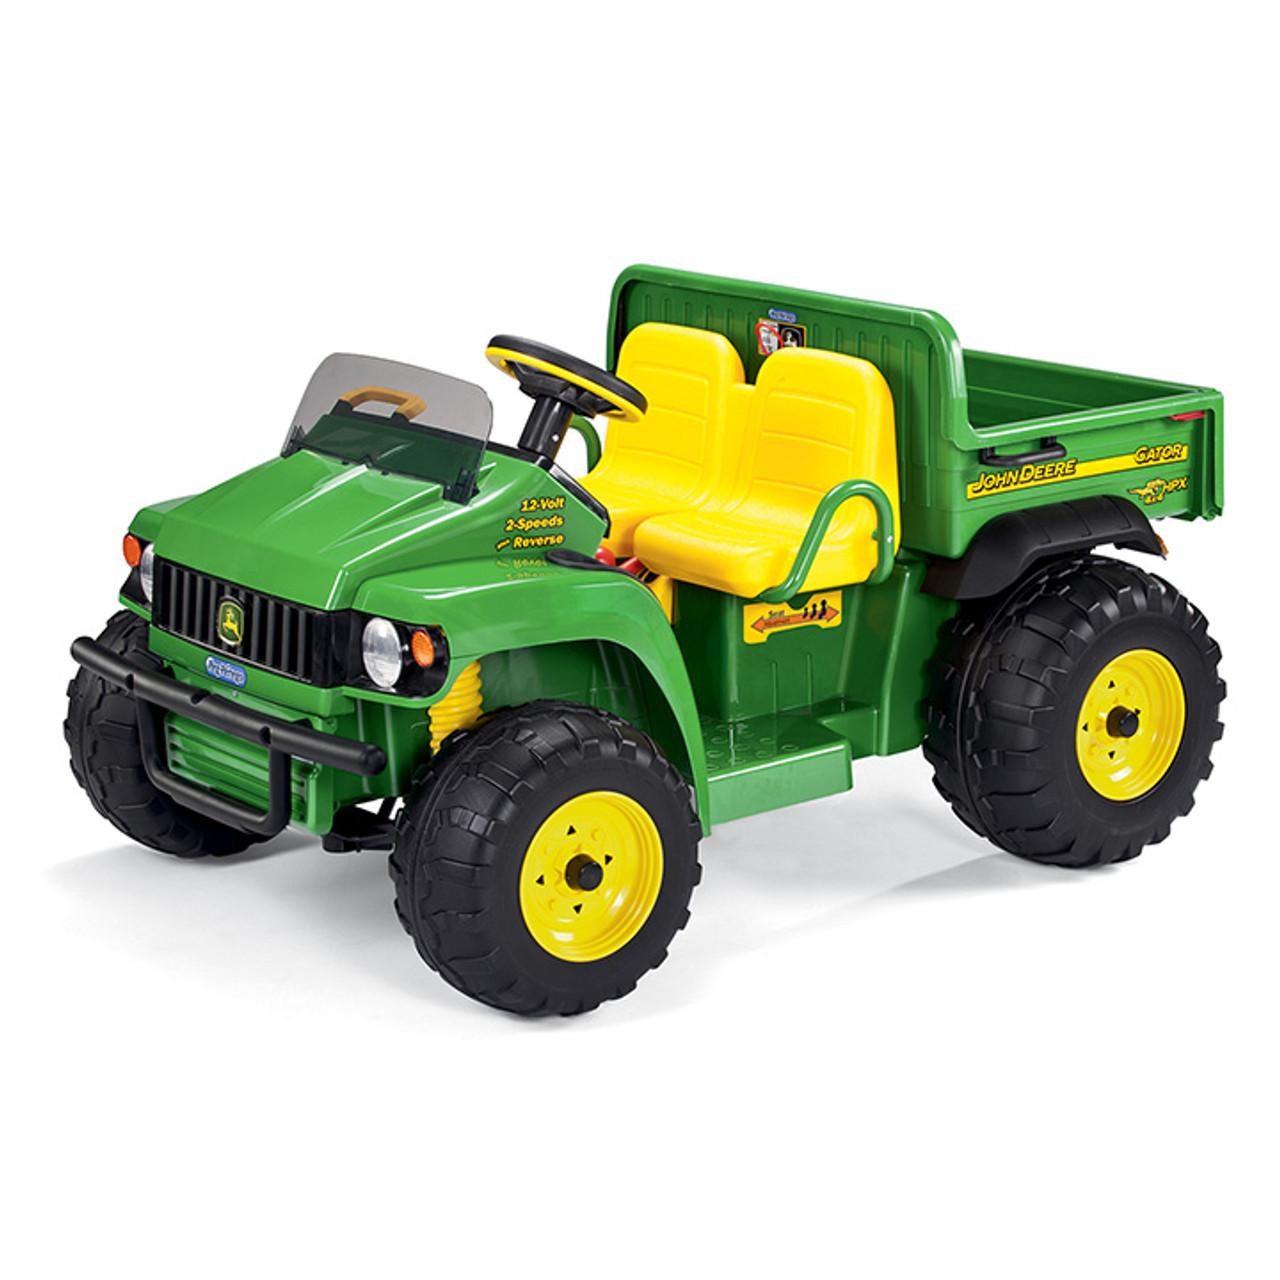 12v tractor